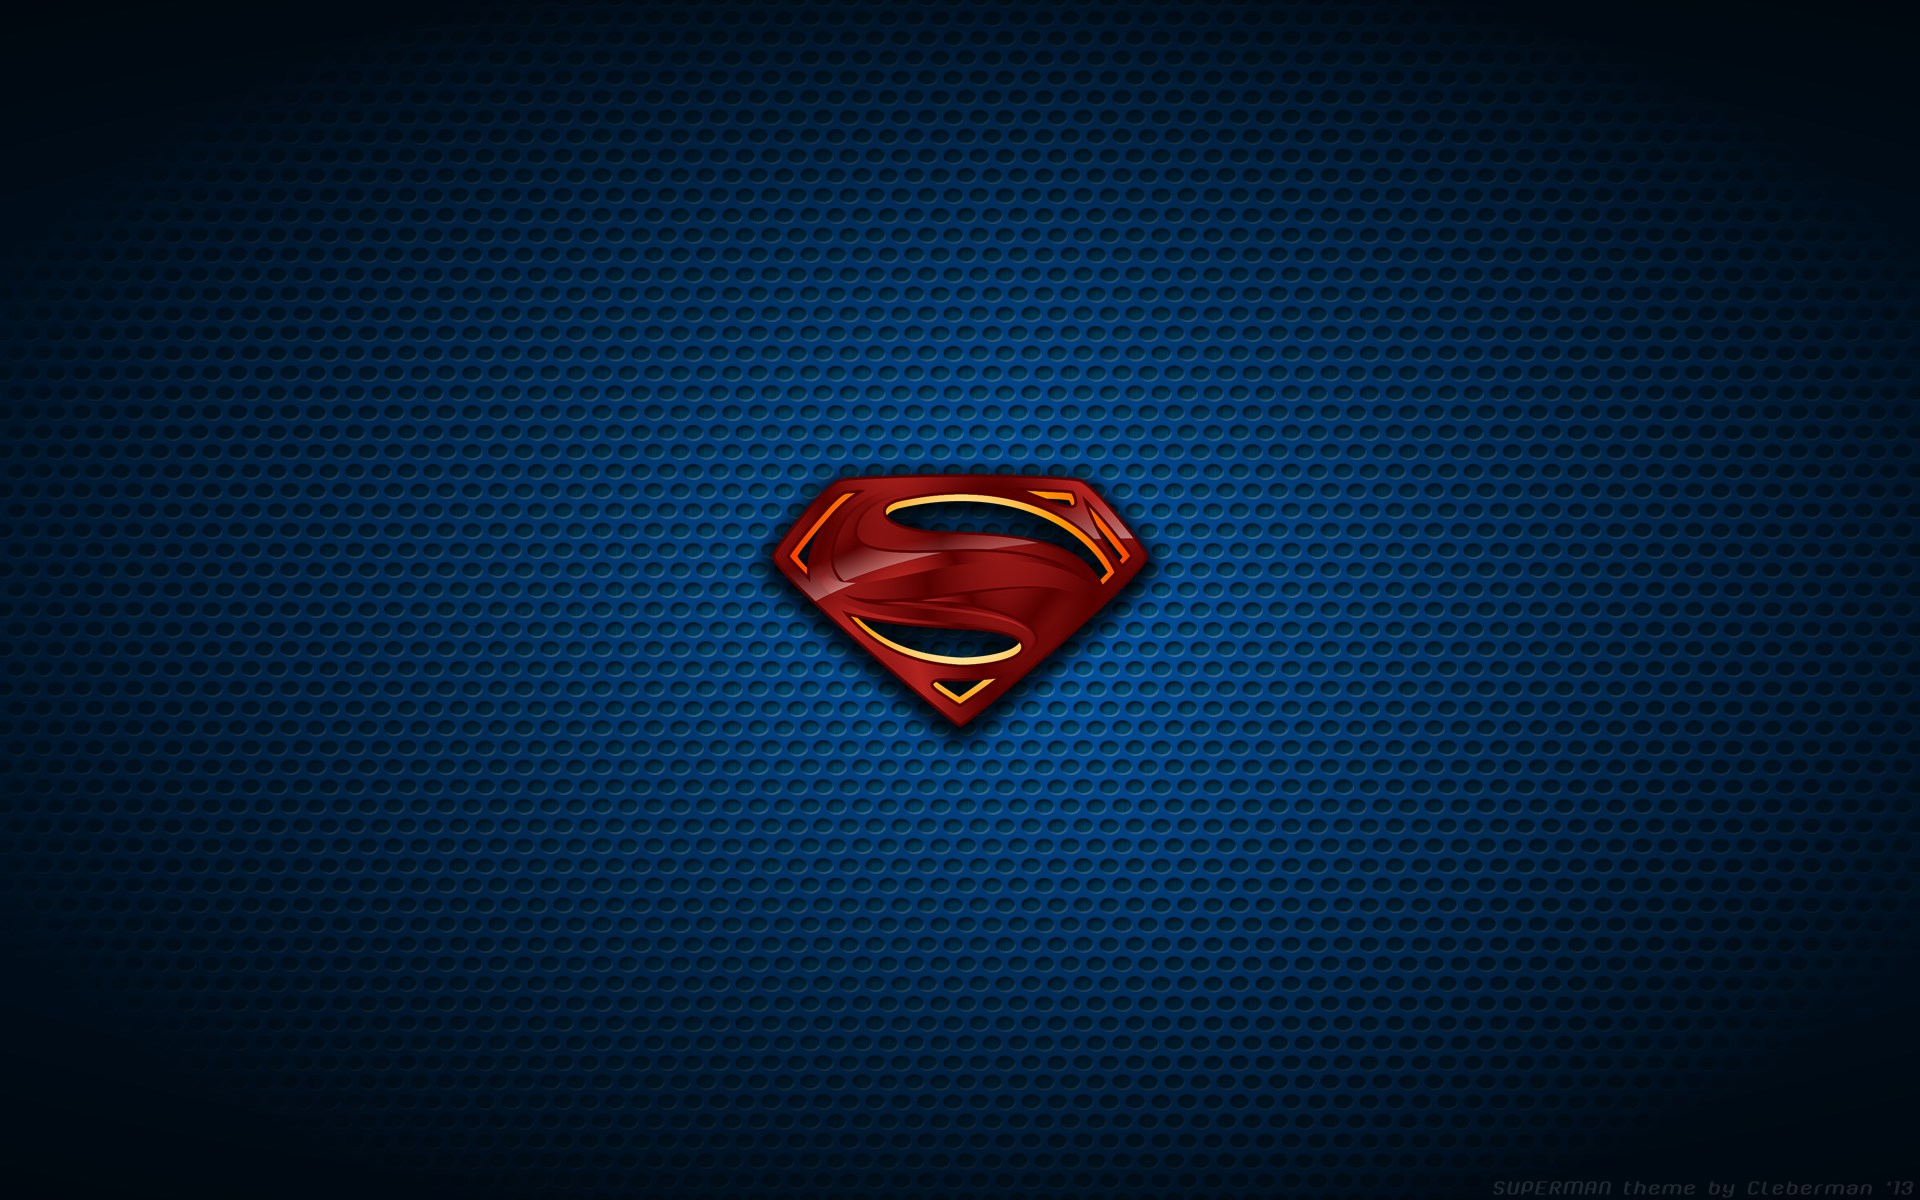 Hd wallpaper superman - Superman Hd Wallpapers Best Hd Desktop Wallpapers Widescreen